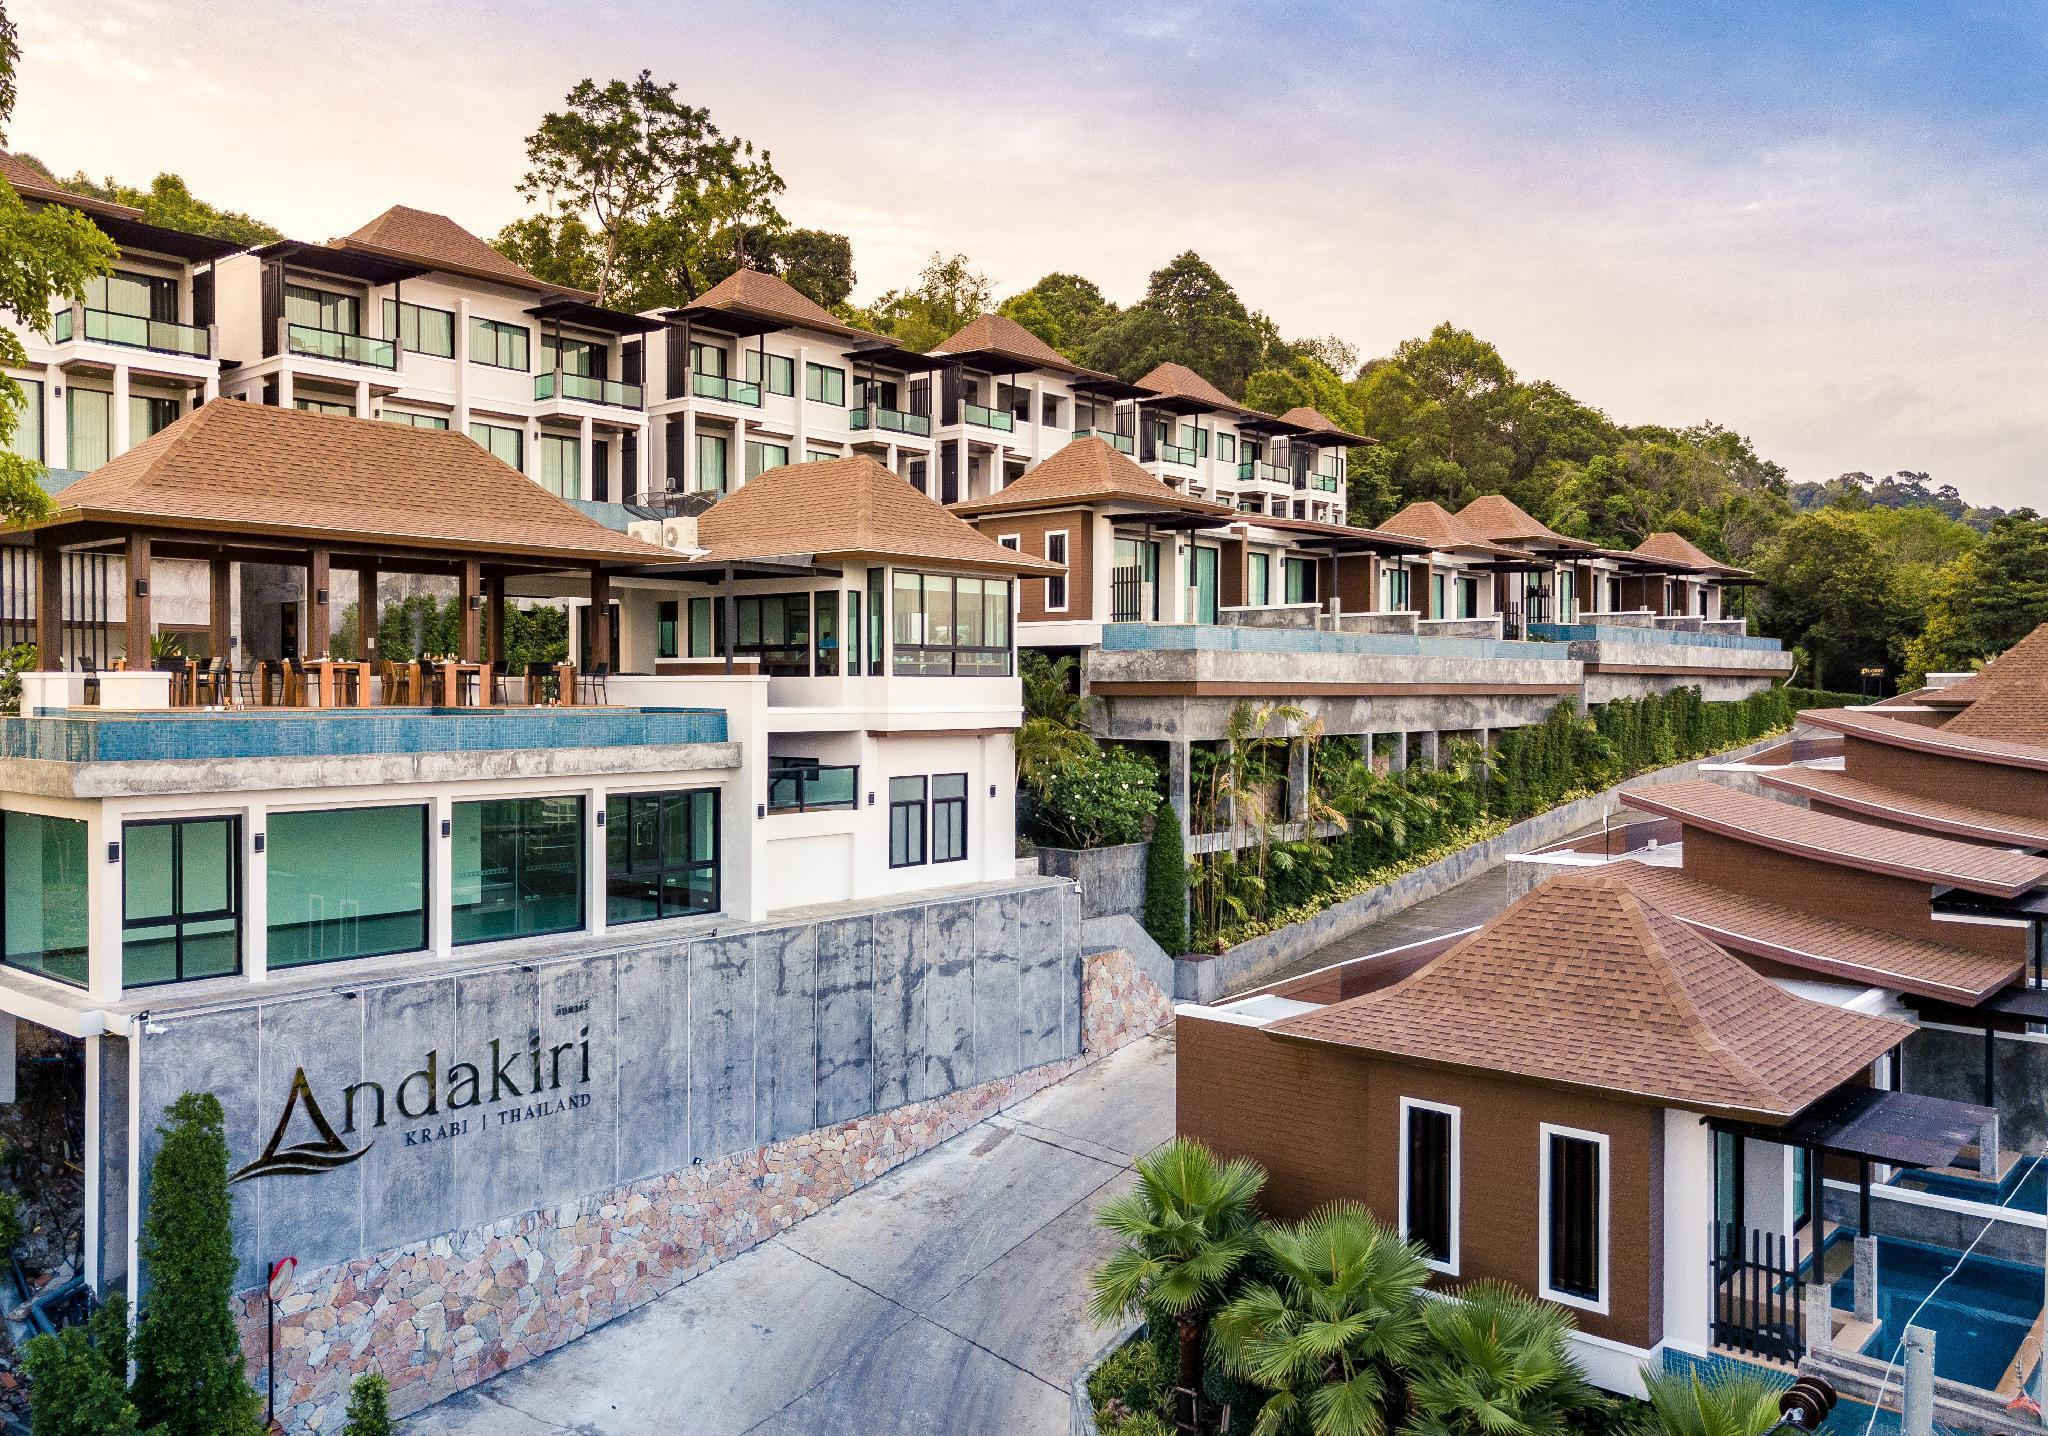 Andakiri Pool Villa Panoramic Sea View อันดาคีรี พูลวิลลา พาโนรามิค ซีวิว